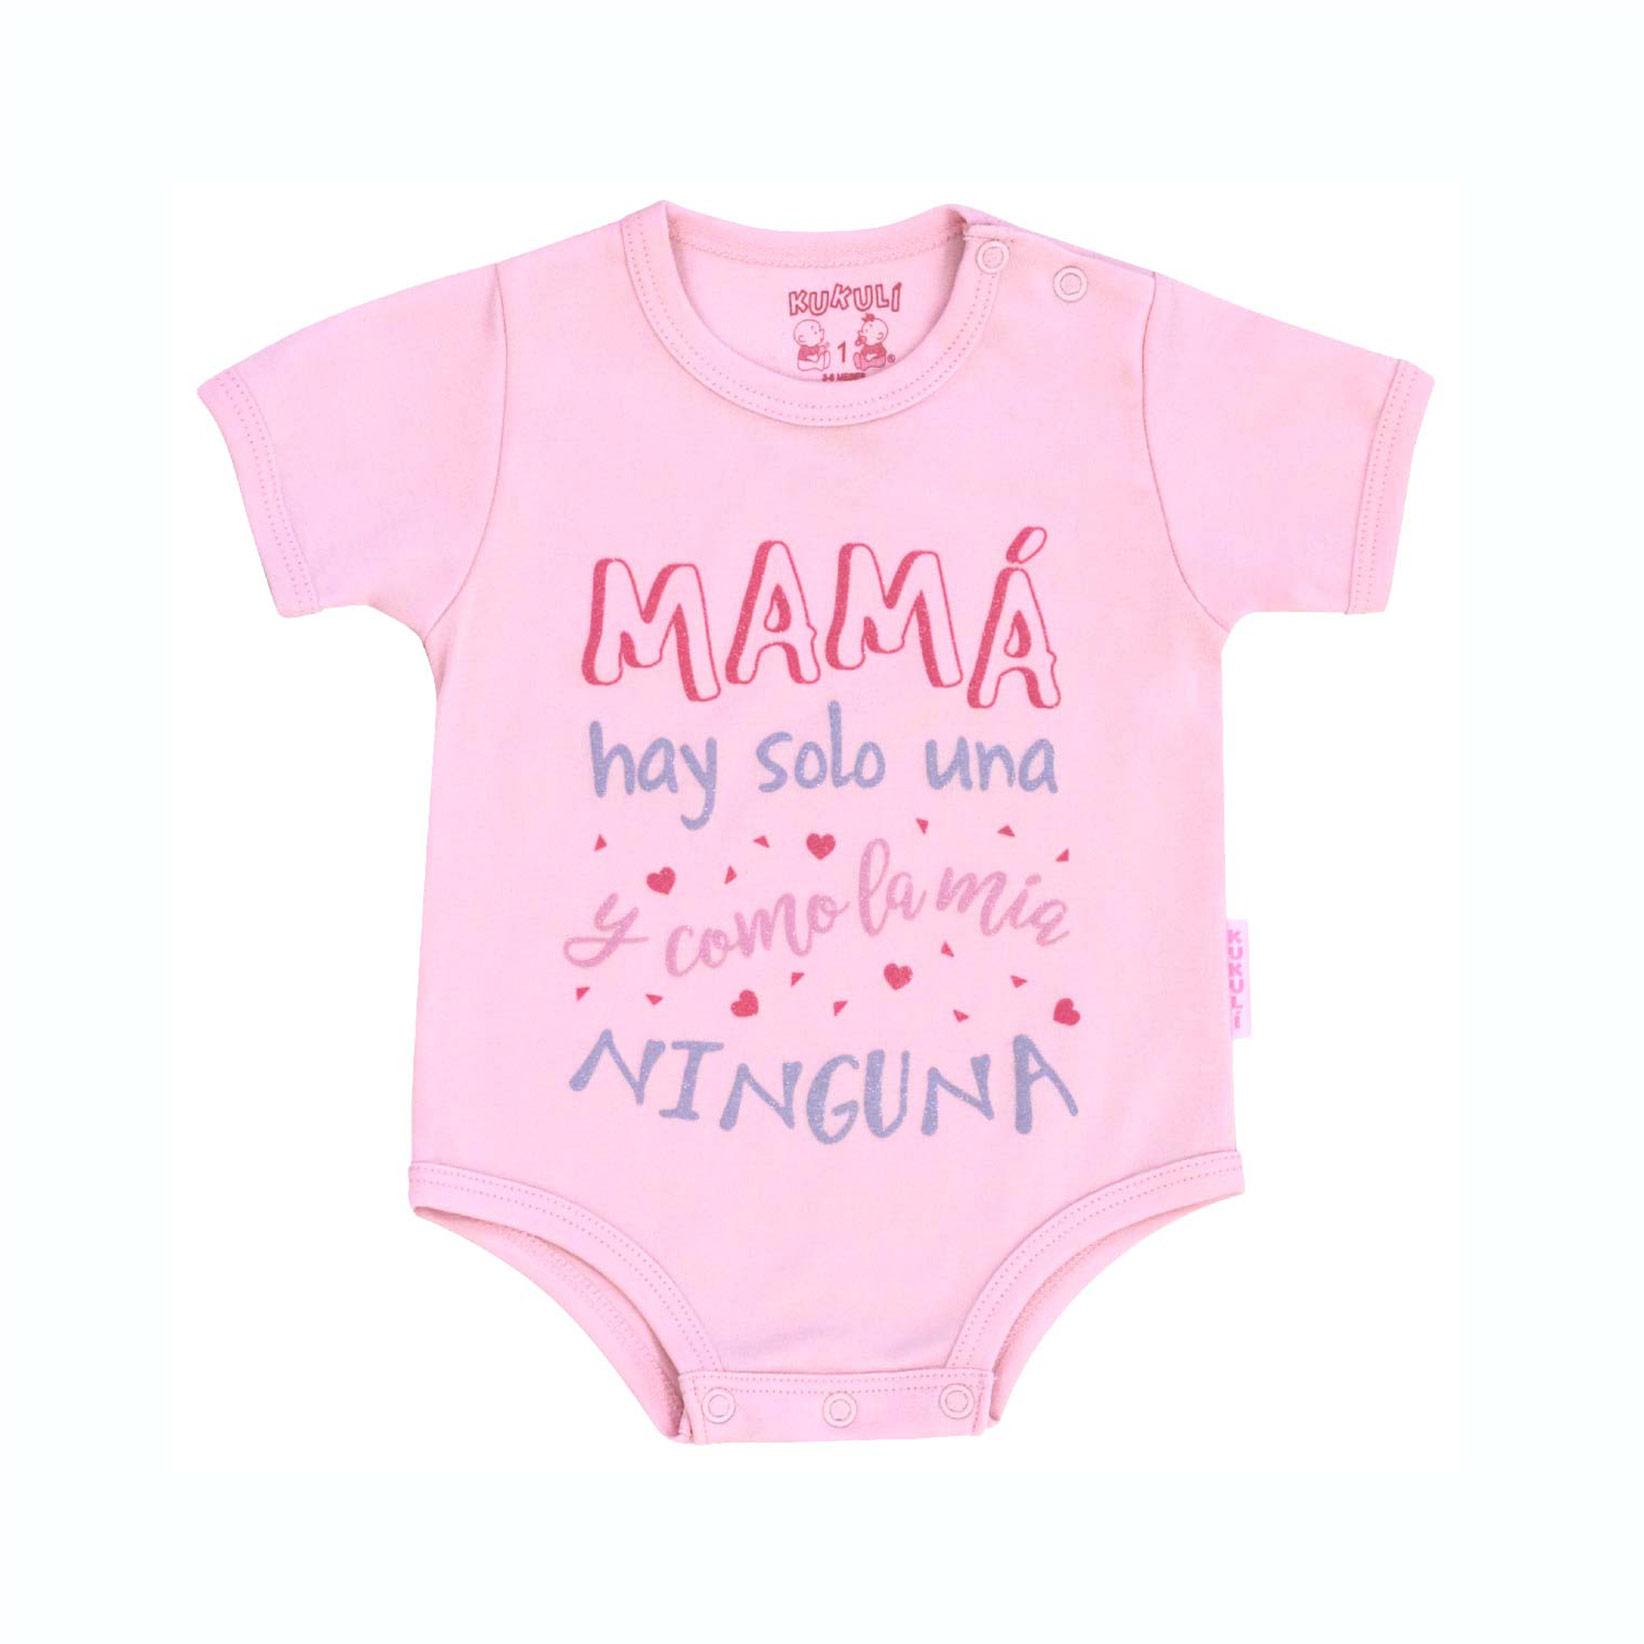 BODY EMMA - MAMÁ